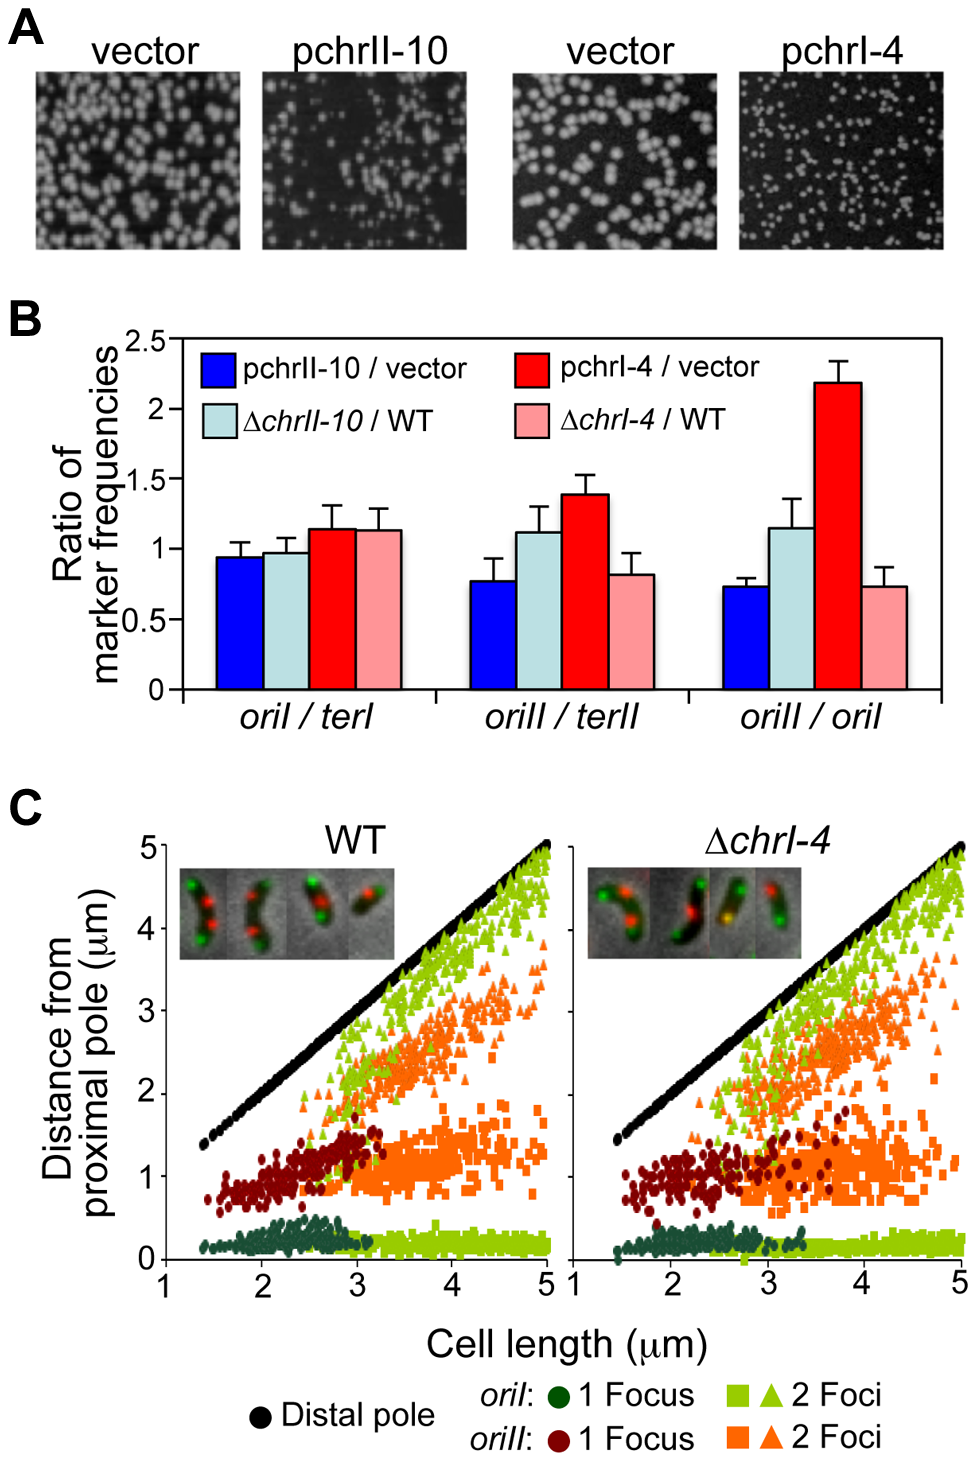 The newly identified RctB binding sites affect <i>V. cholerae</i> growth and chromosomal replication.